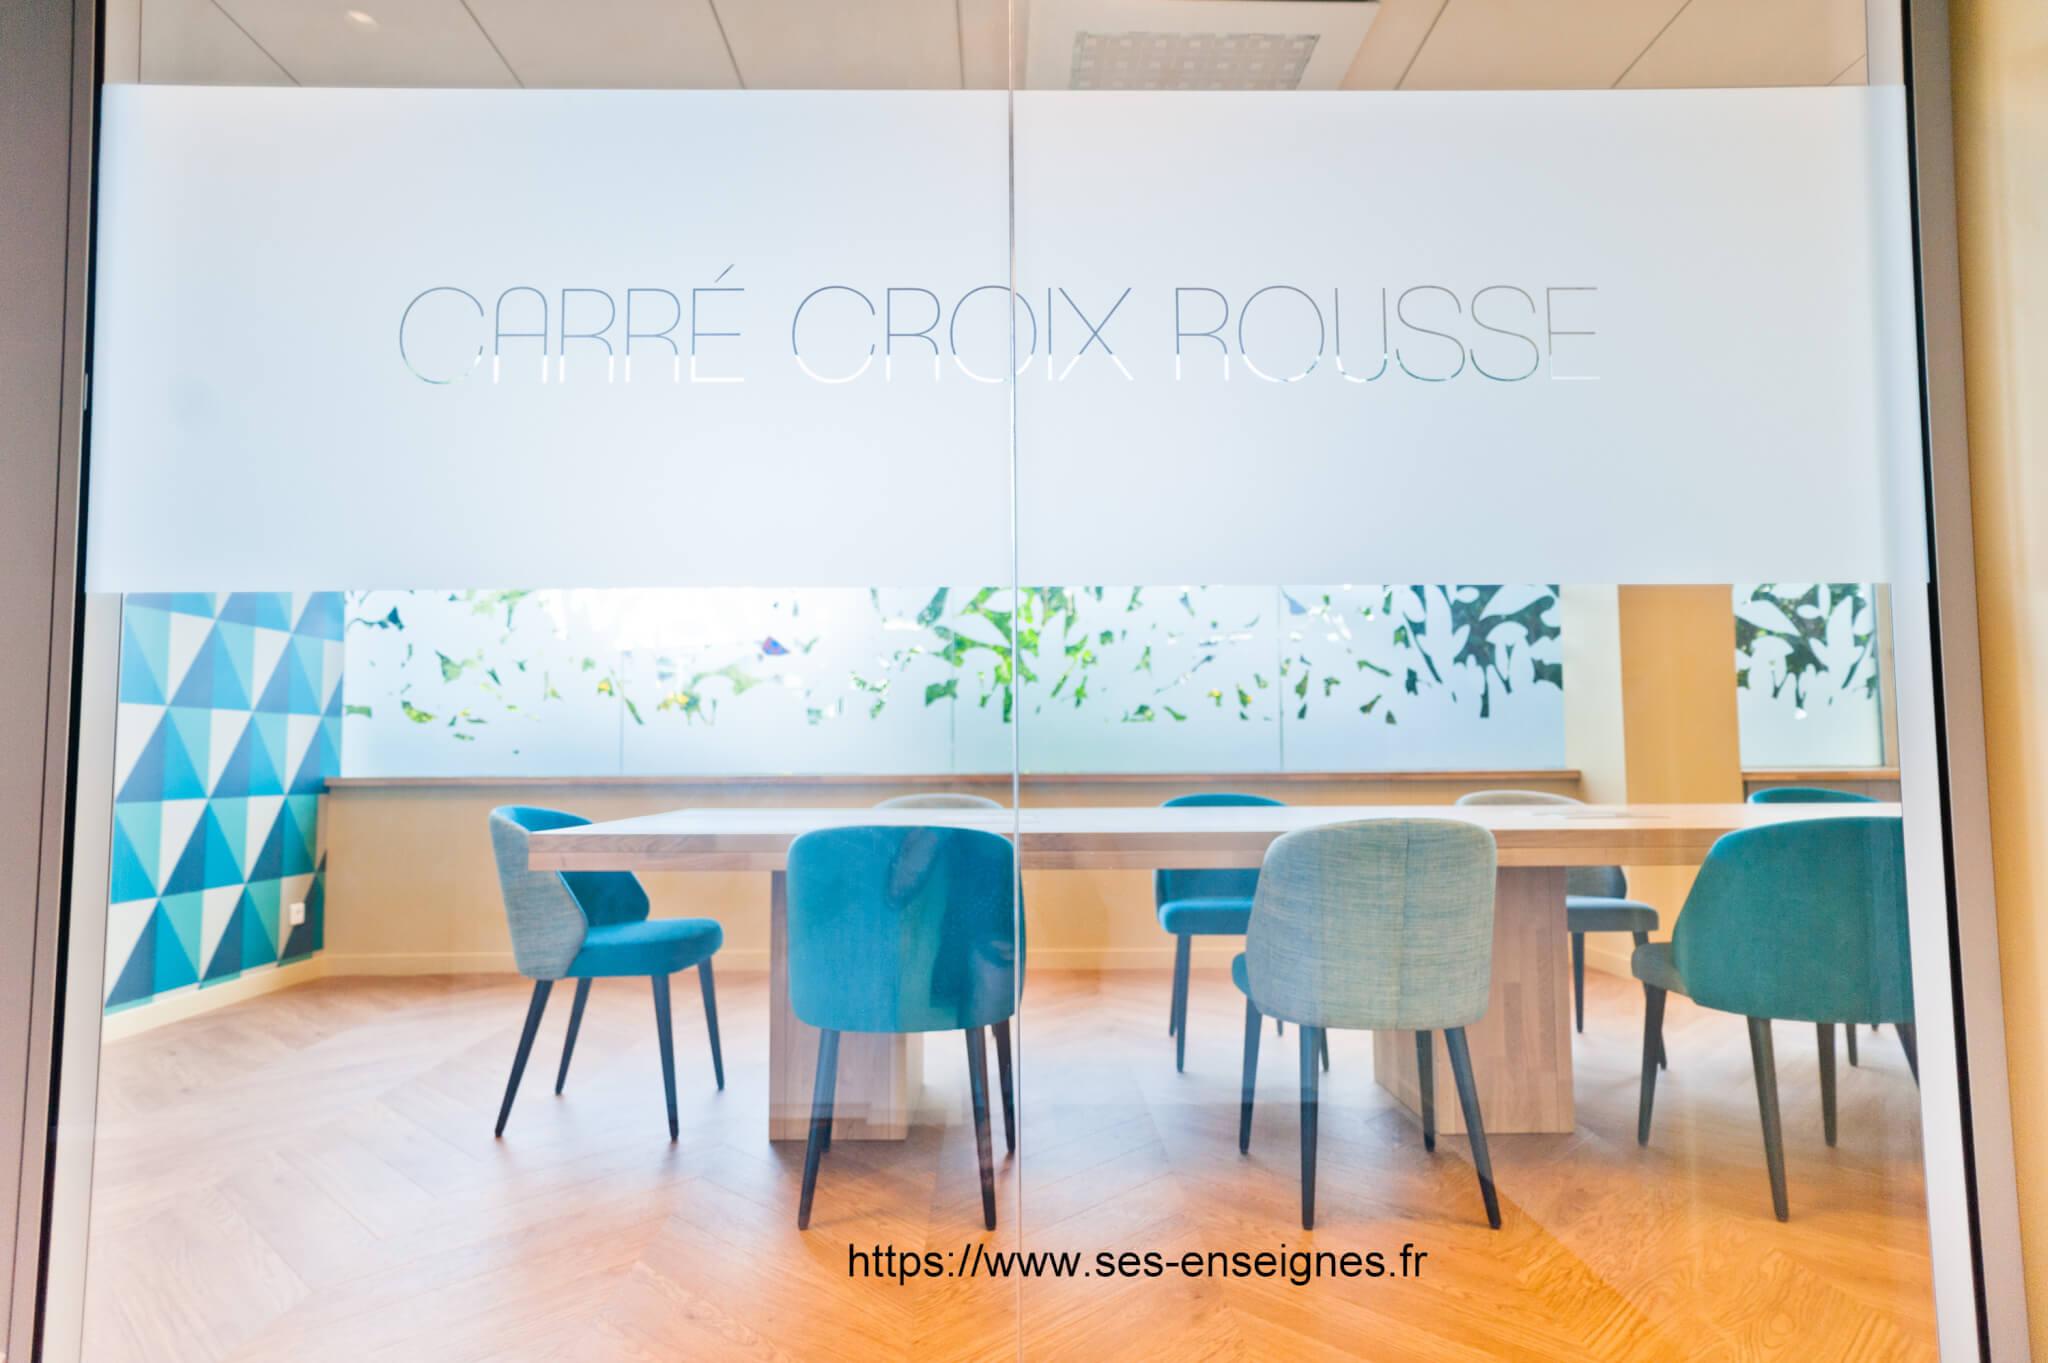 Vitrophanie portes de bureaux Lyon- Adhésif dépoli - Fabrication et installation dépoli